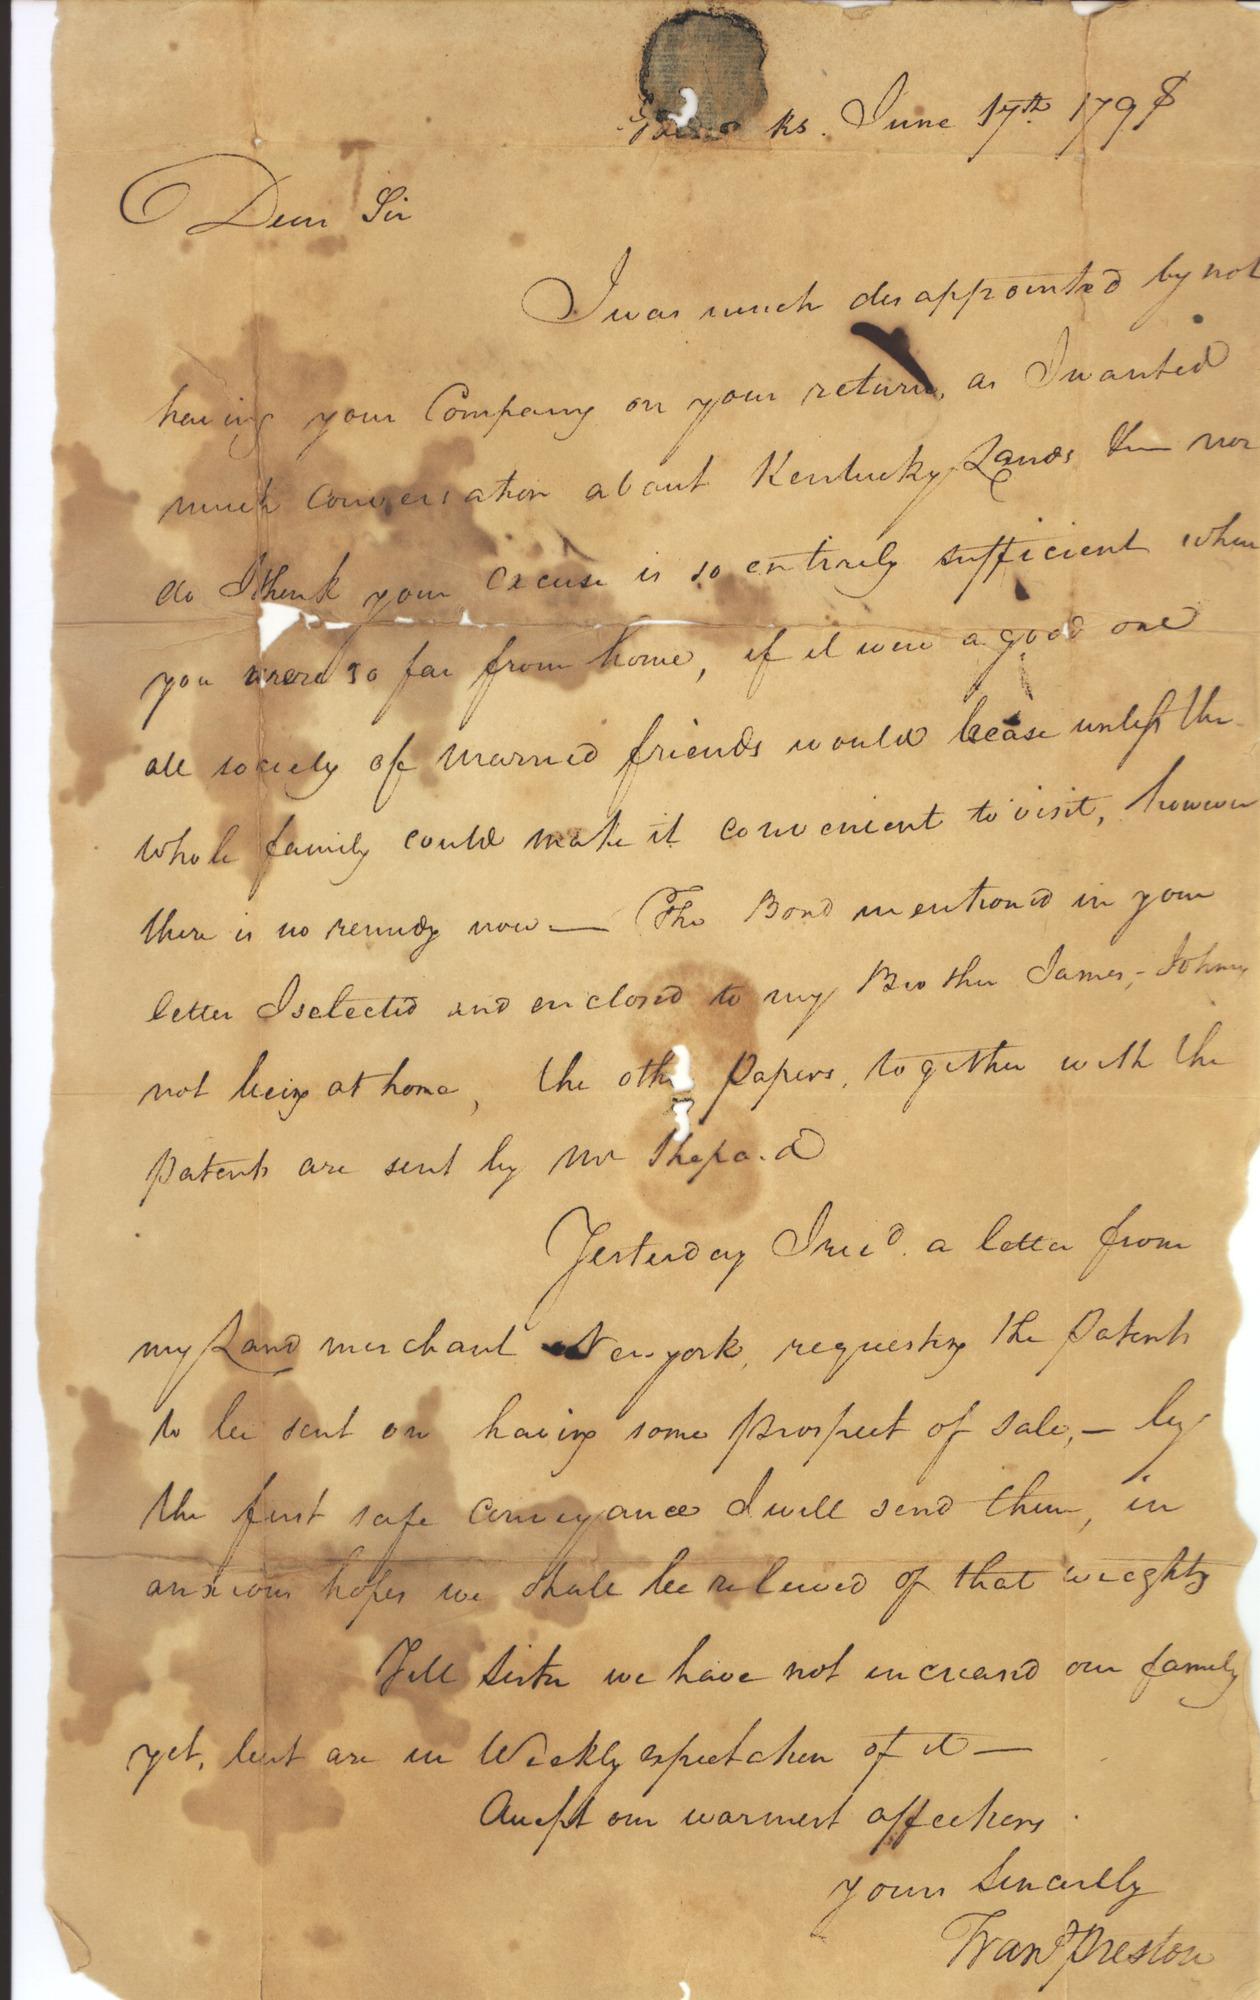 Ms1997_002_SmithfieldPreston_Letter_1798_0617.jpg